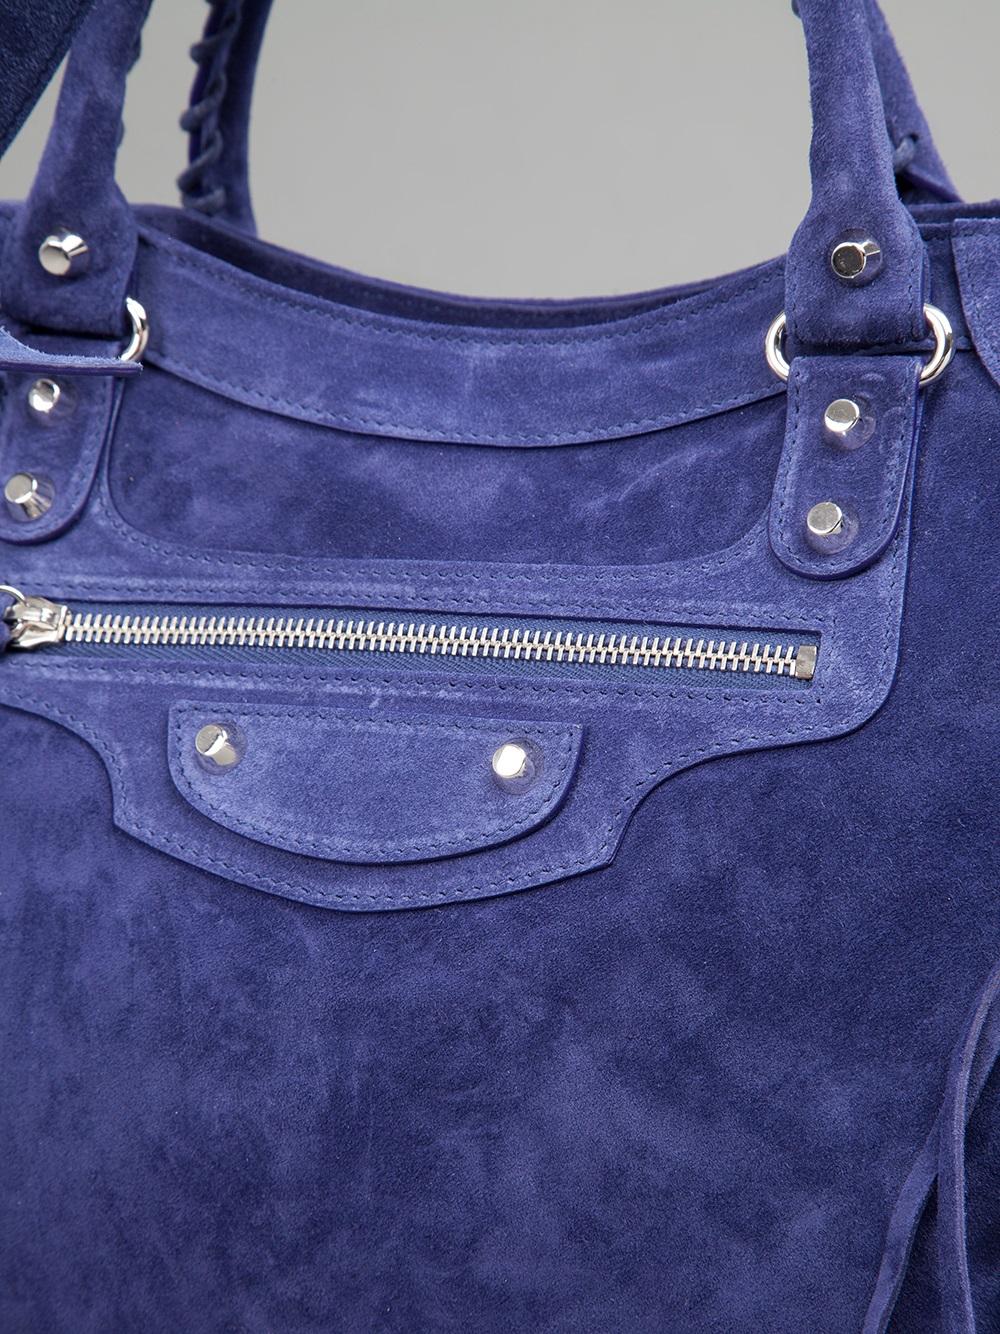 Balenciaga Baby Daim Velo Bag in Purple